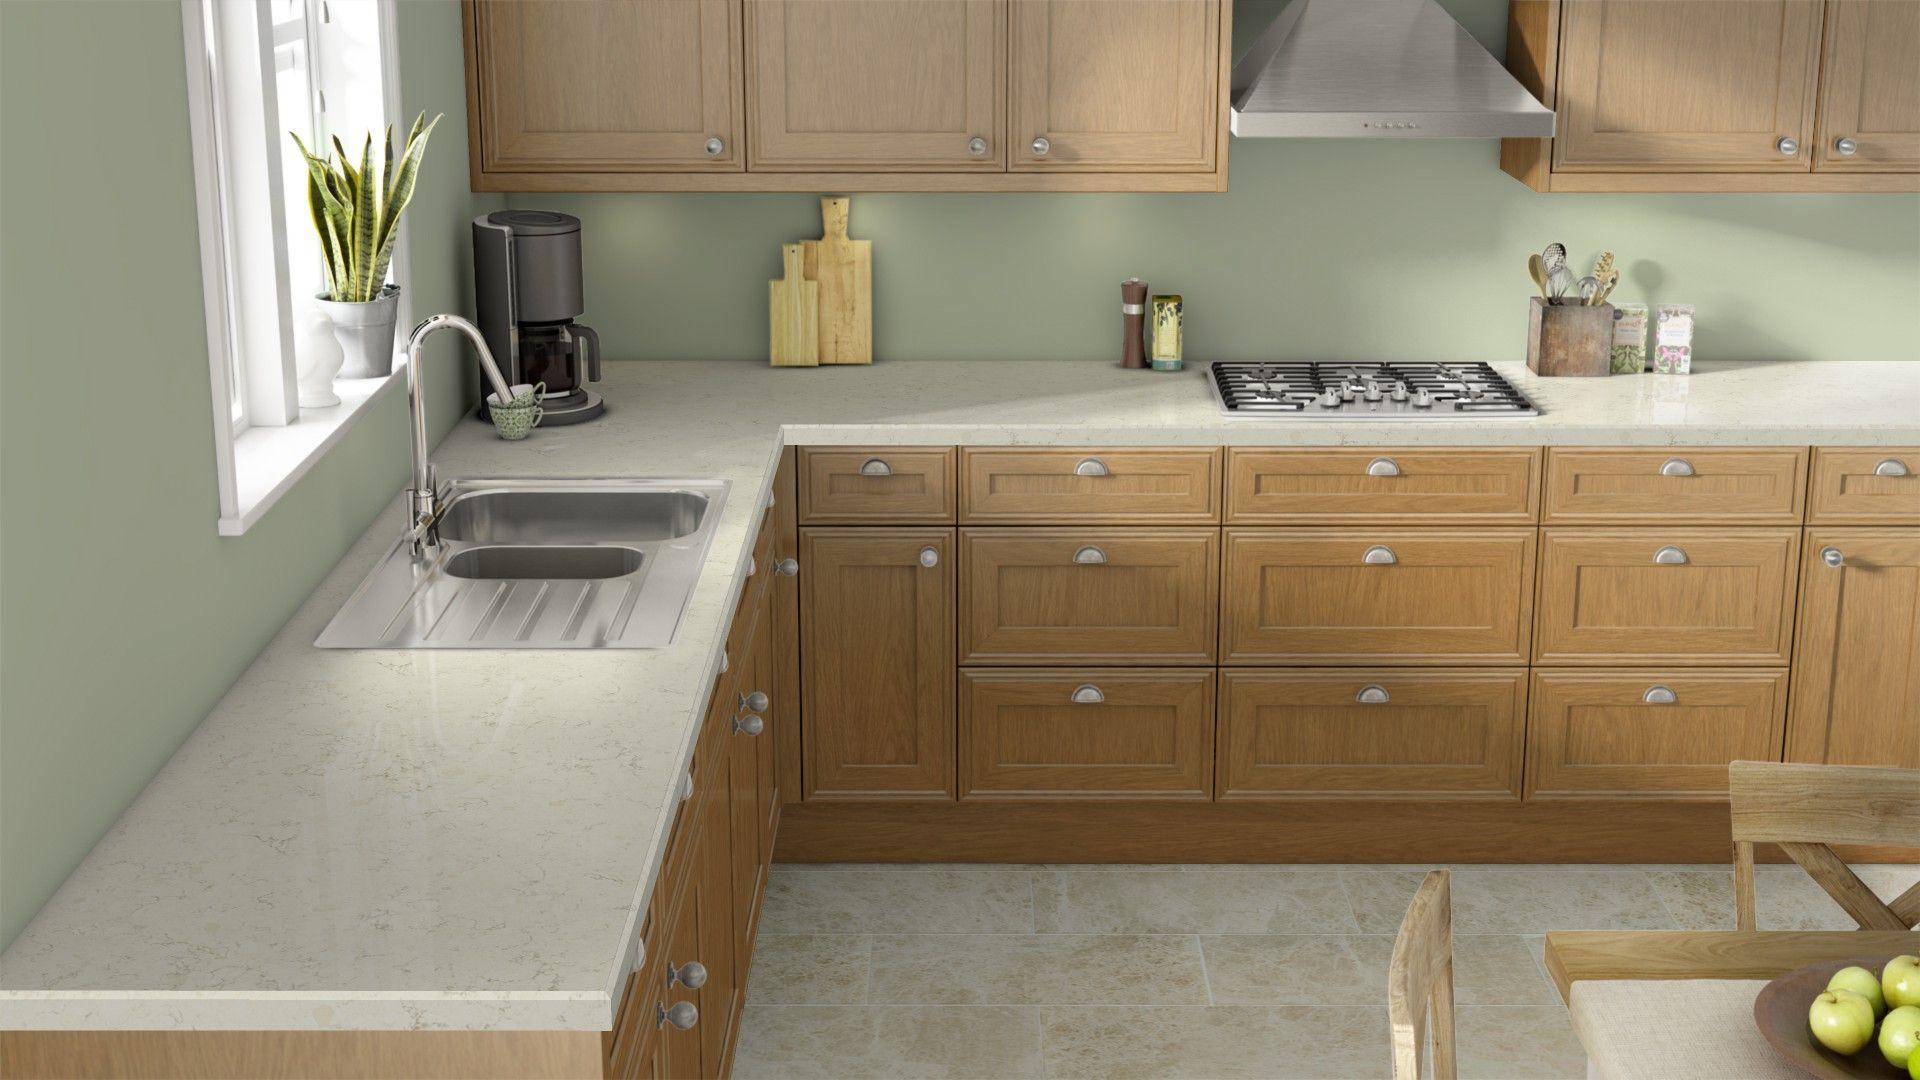 Oak Kitchen Cabinets With White Quartz Countertops